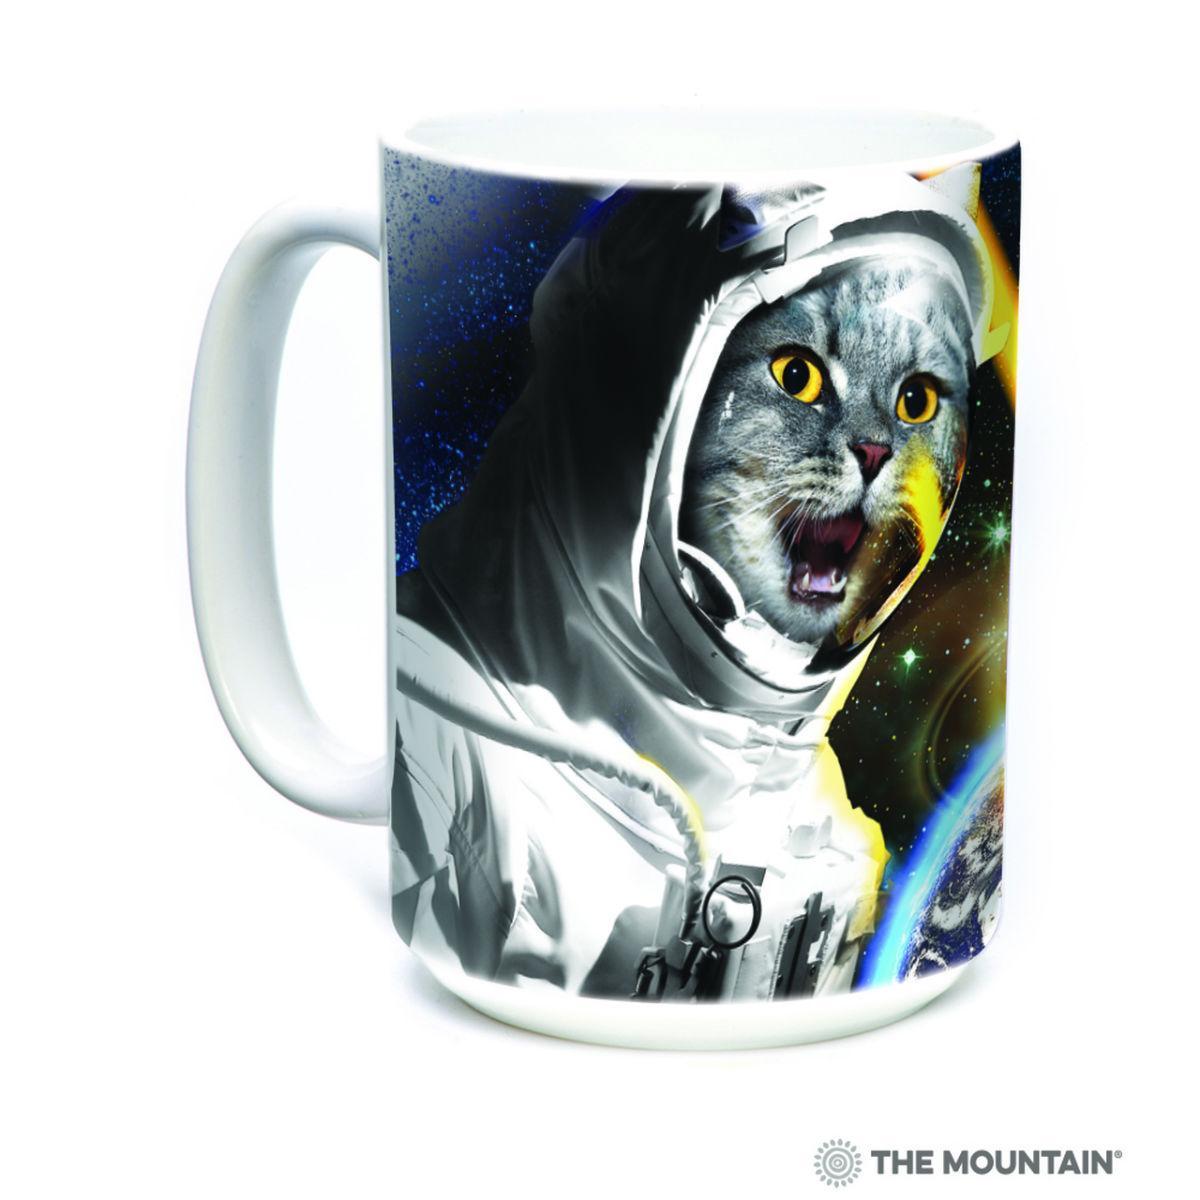 Cataclysm Ceramic Mug by The Mountain